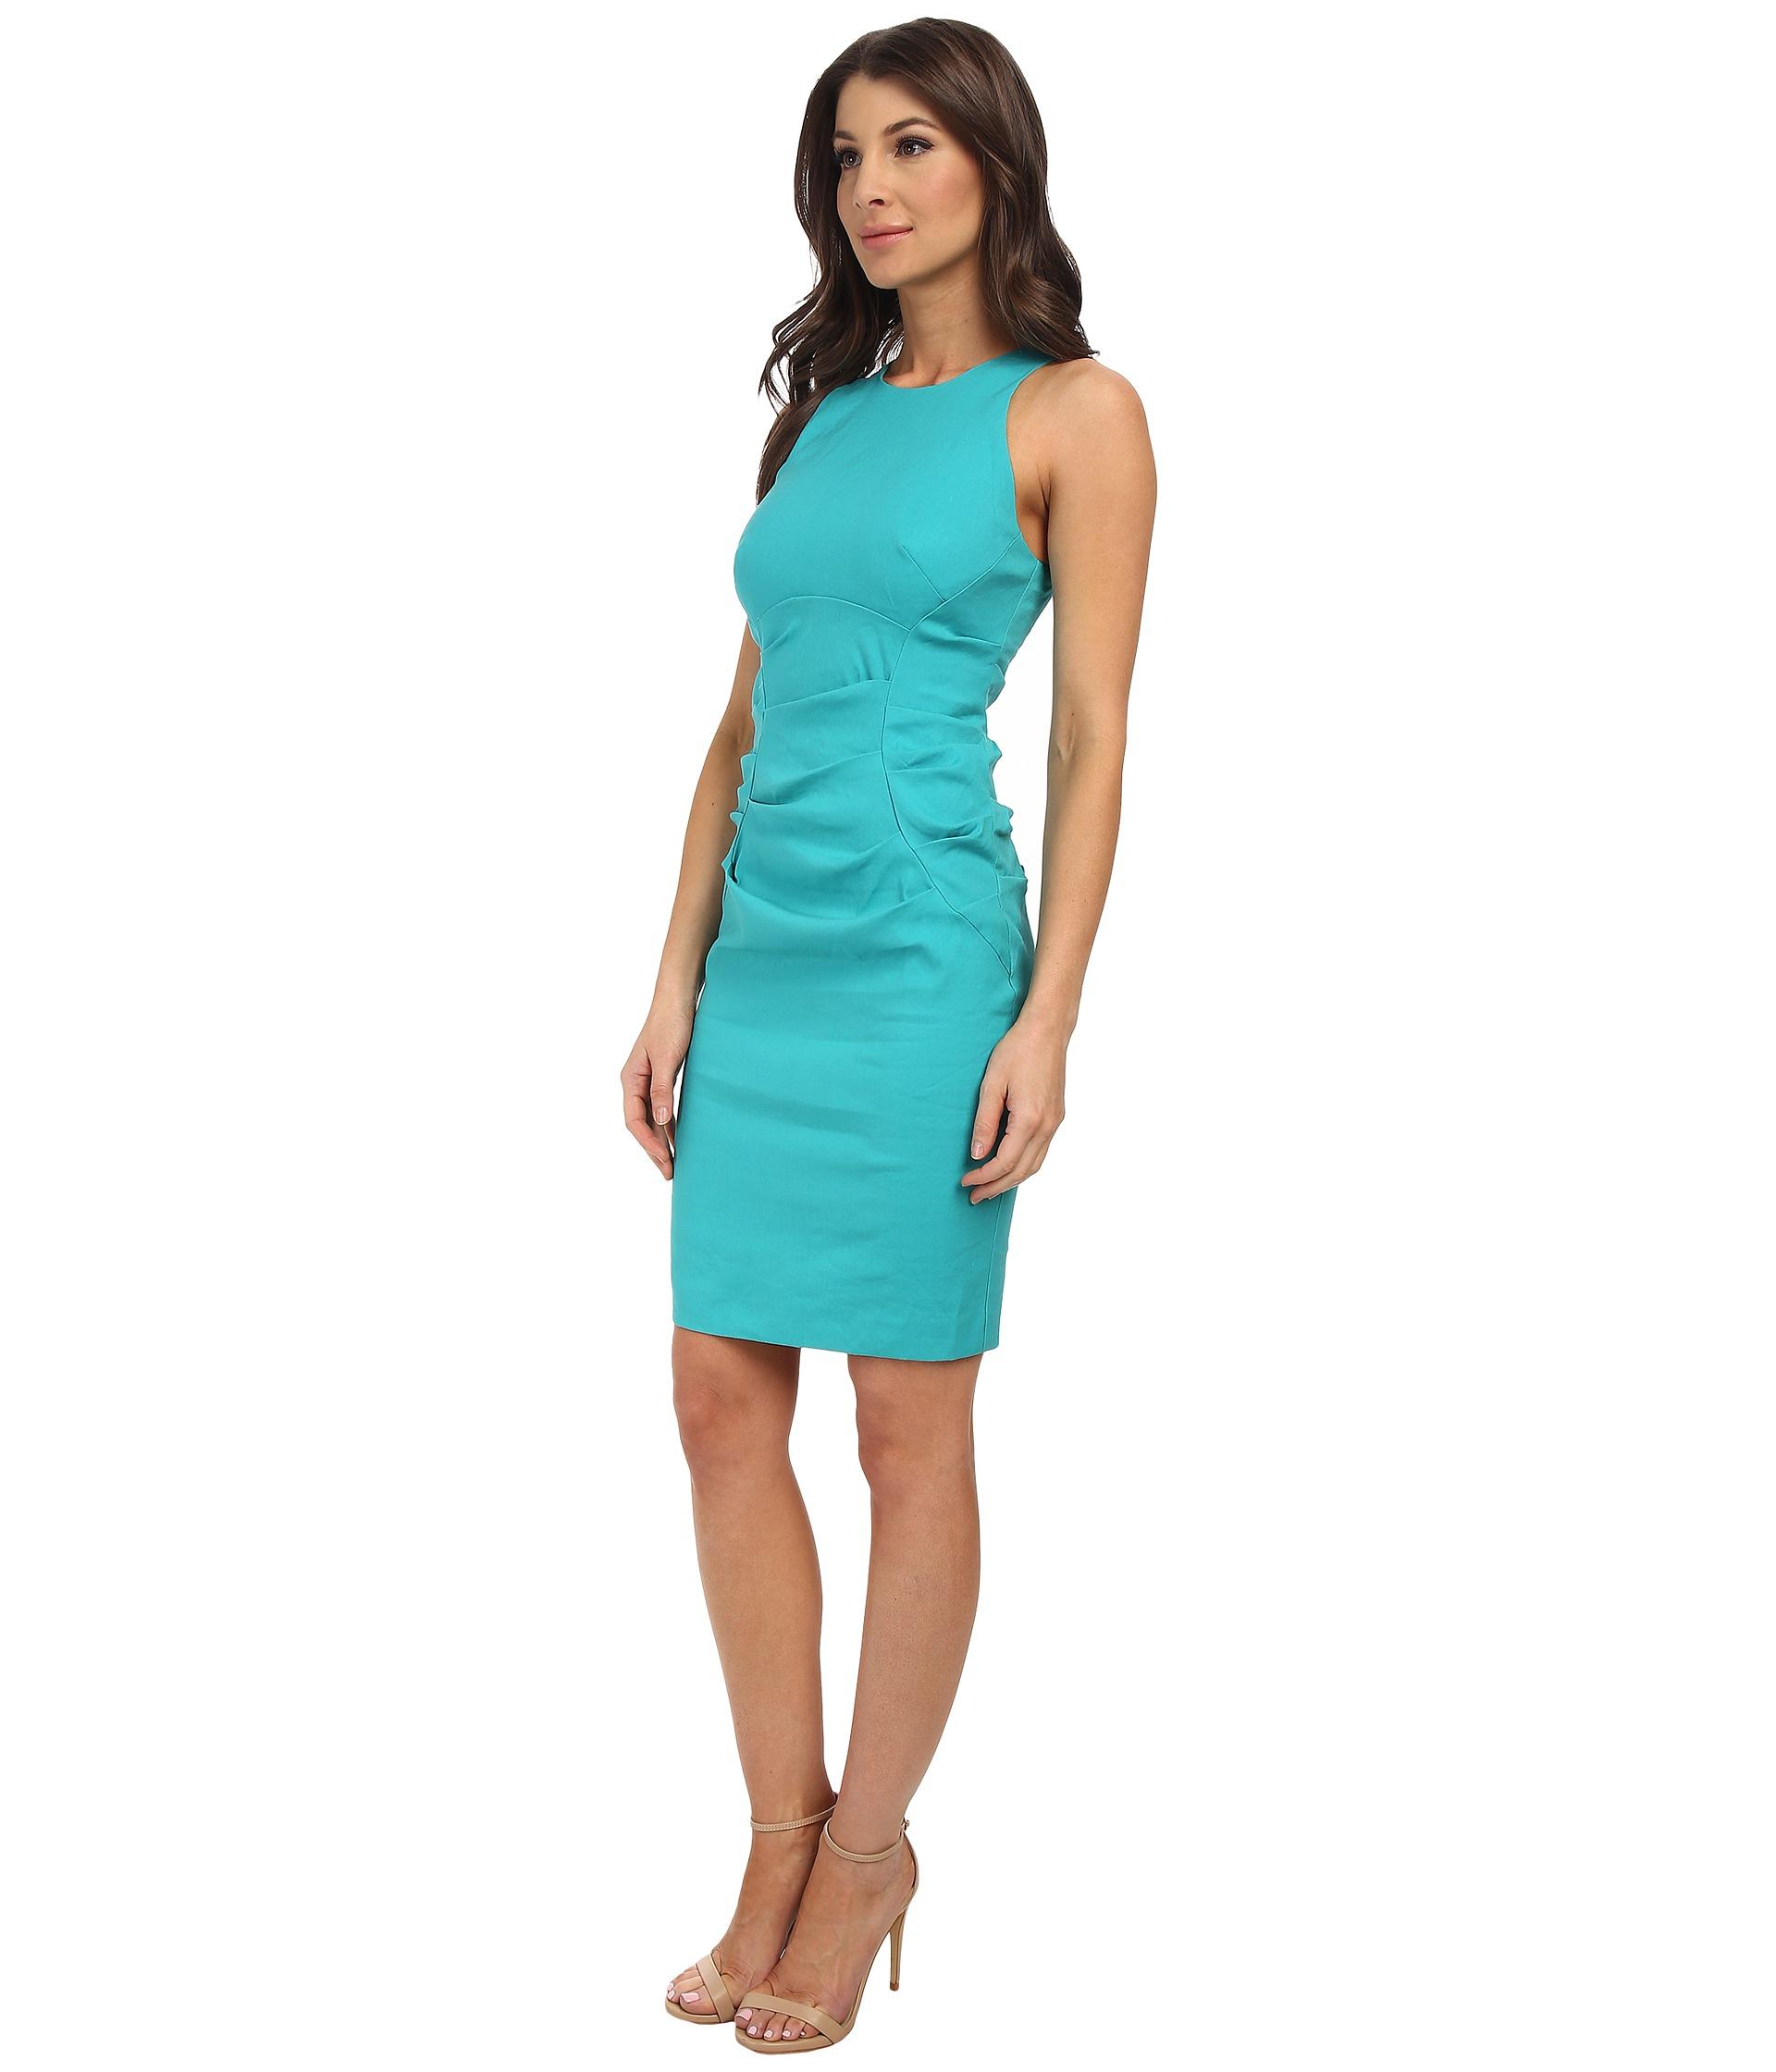 Lyst - Nicole Miller High Neck Stretch Linen Dress in Blue